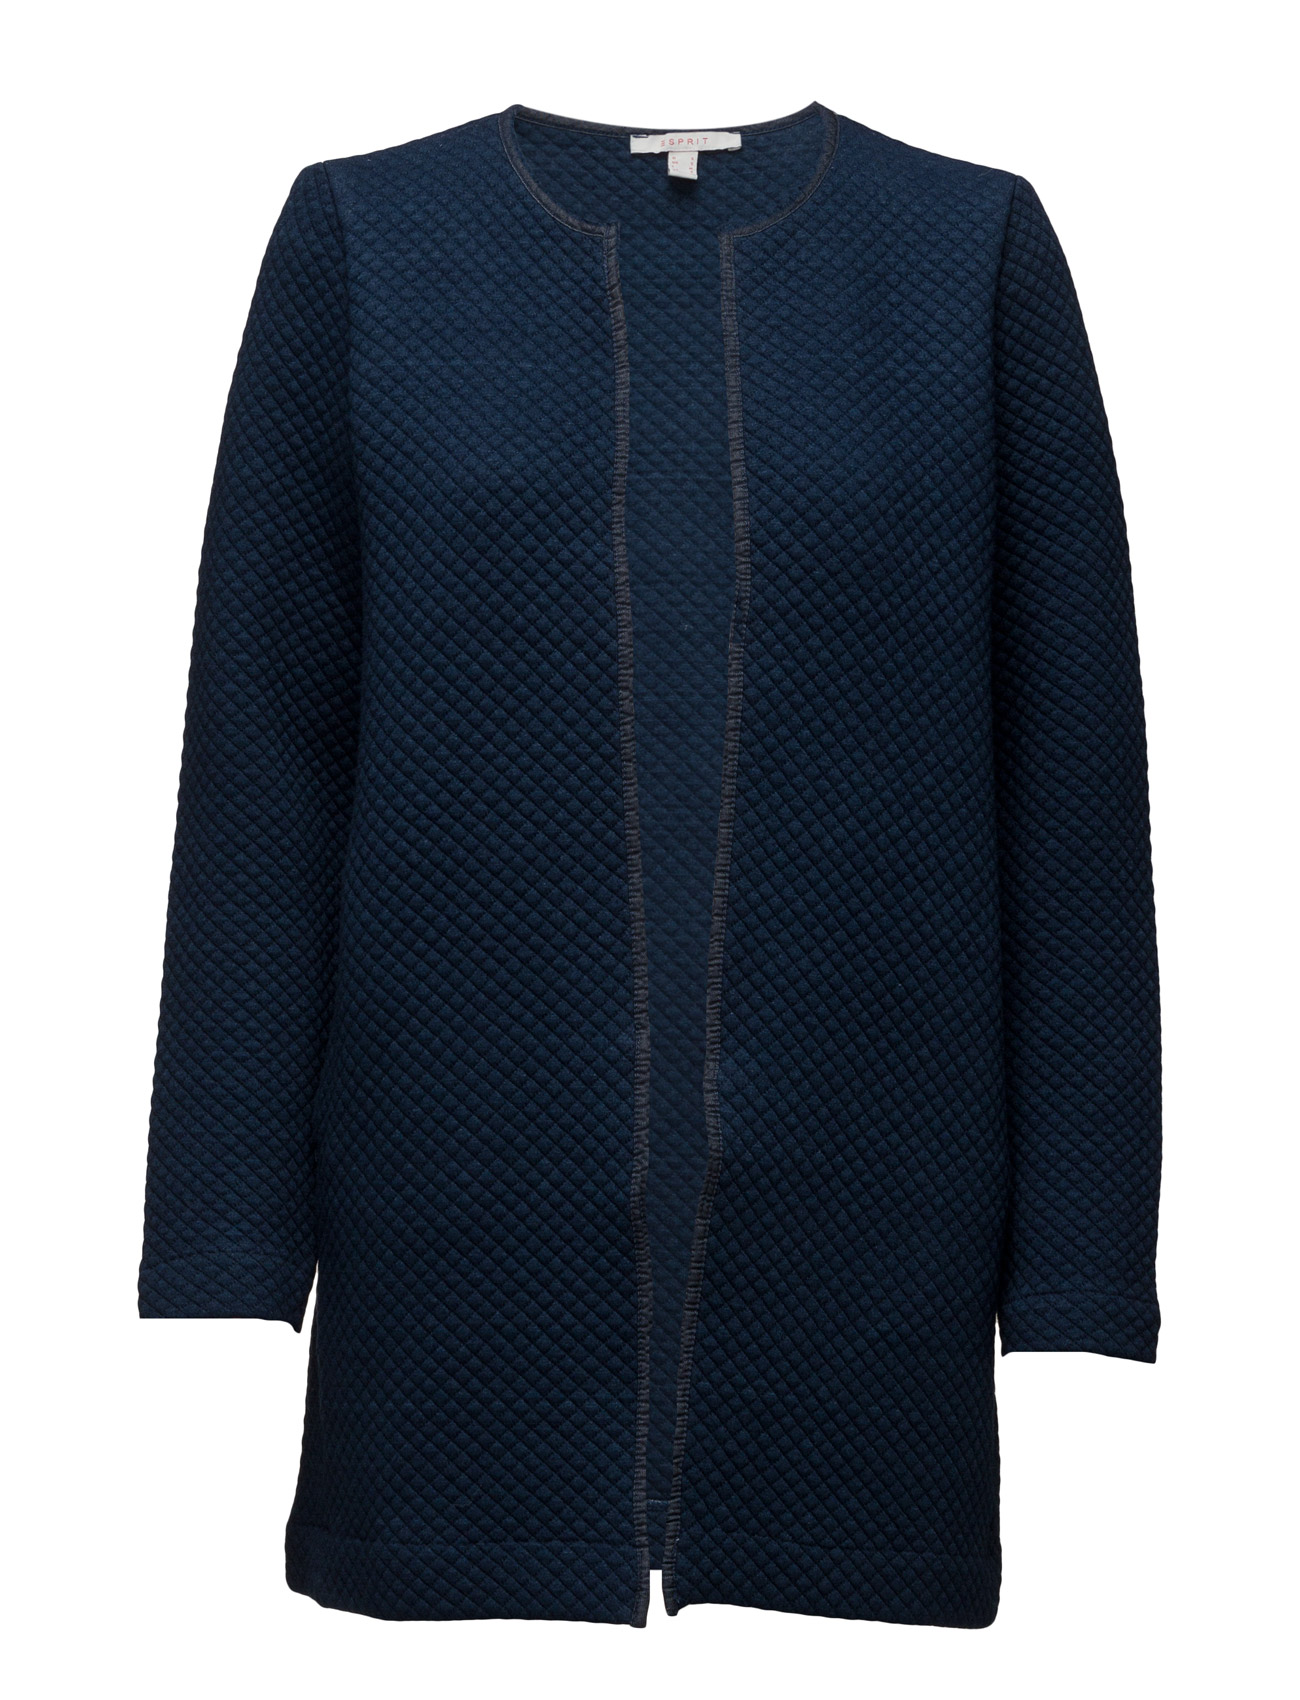 Sweatshirts Cardigan Esprit Casual Striktøj til Kvinder i Blæk